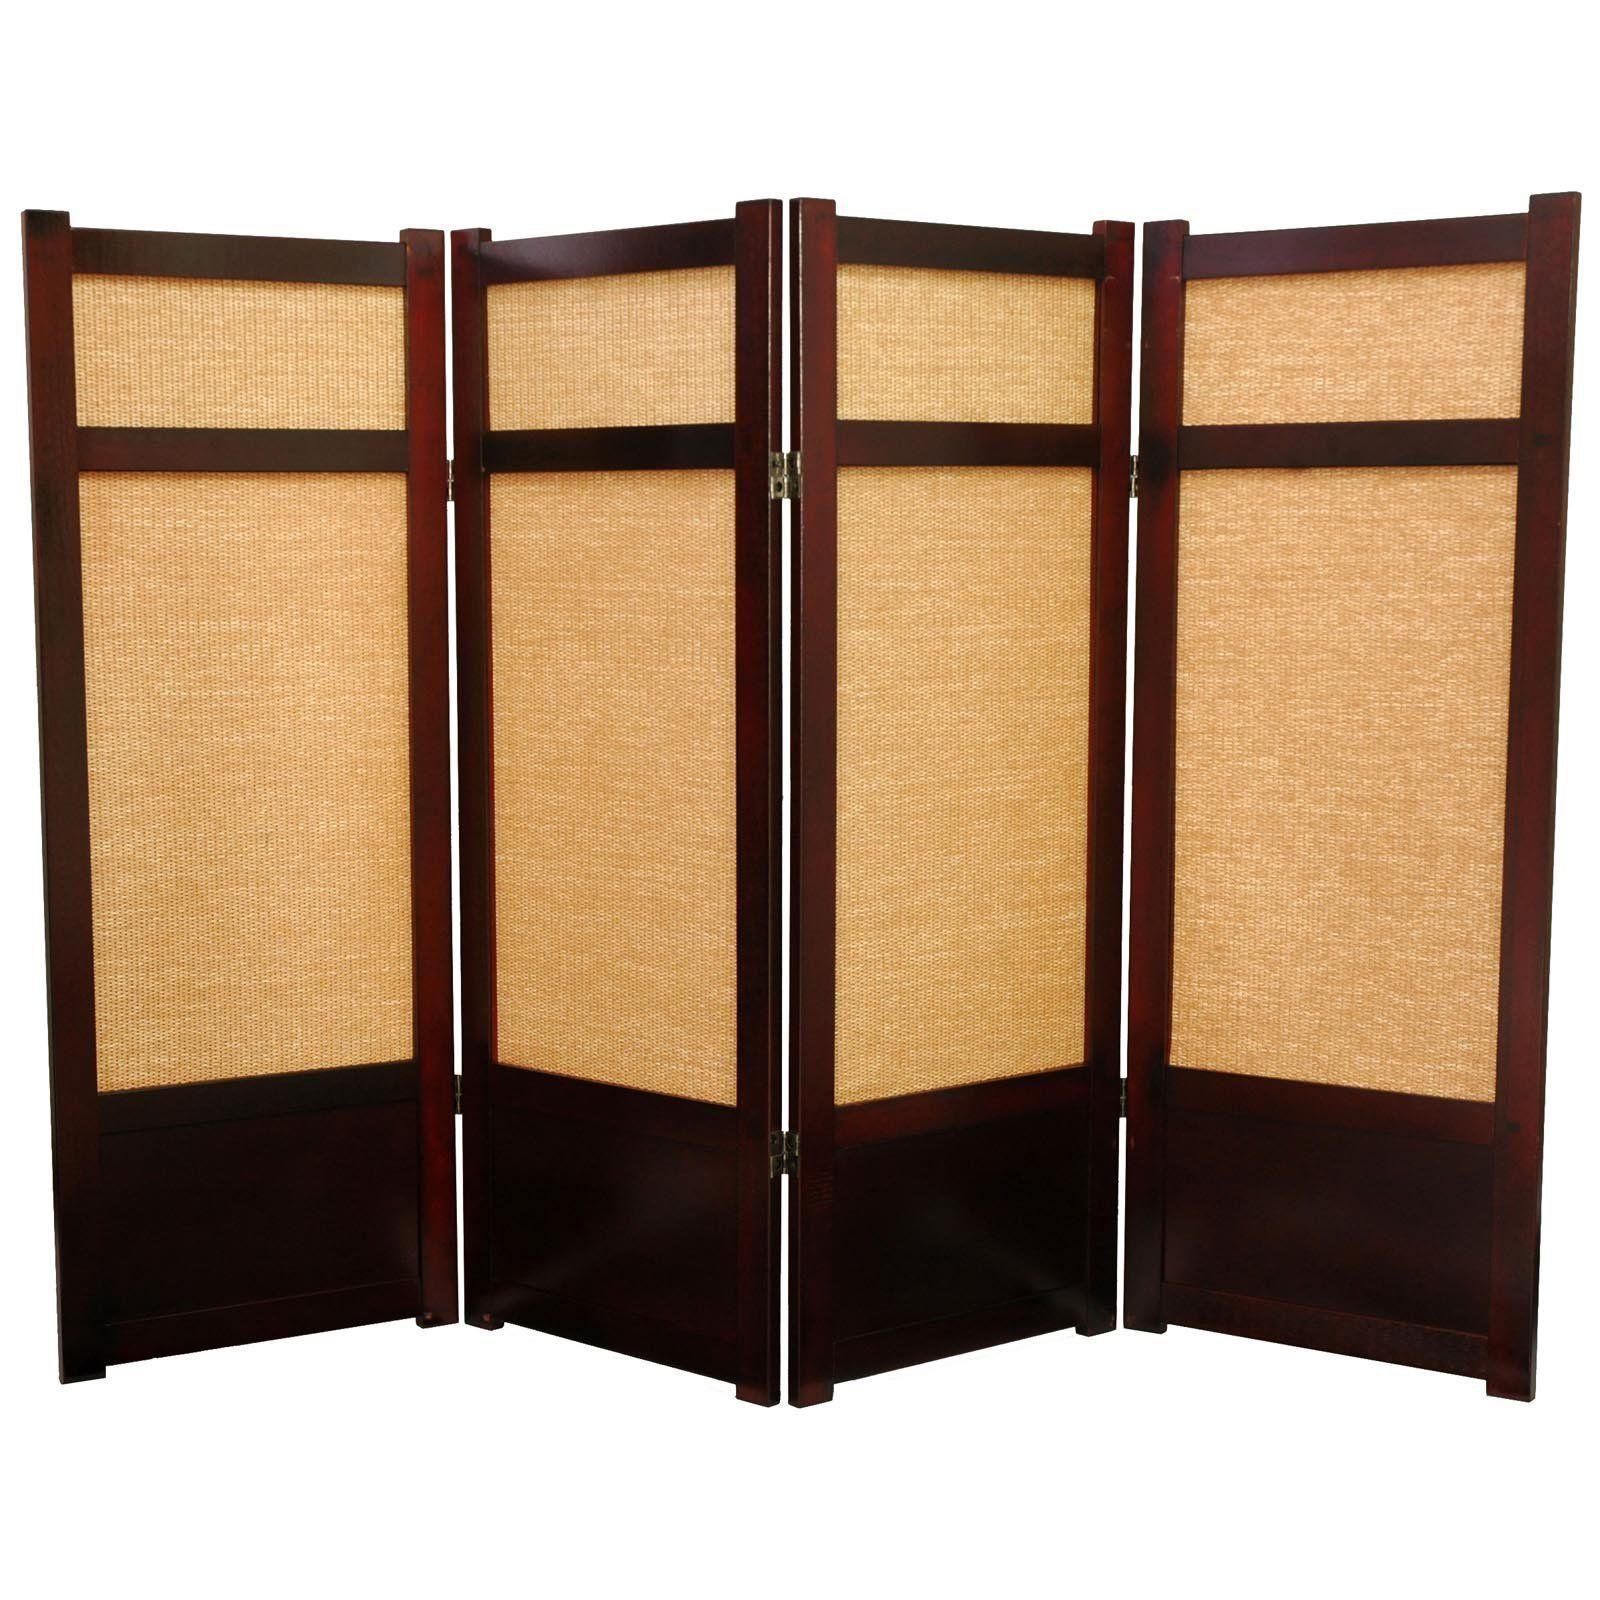 Oriental Furniture Low Jute Fiber Shoji Screen Room Divider - 48H in. | from hayneedle.com